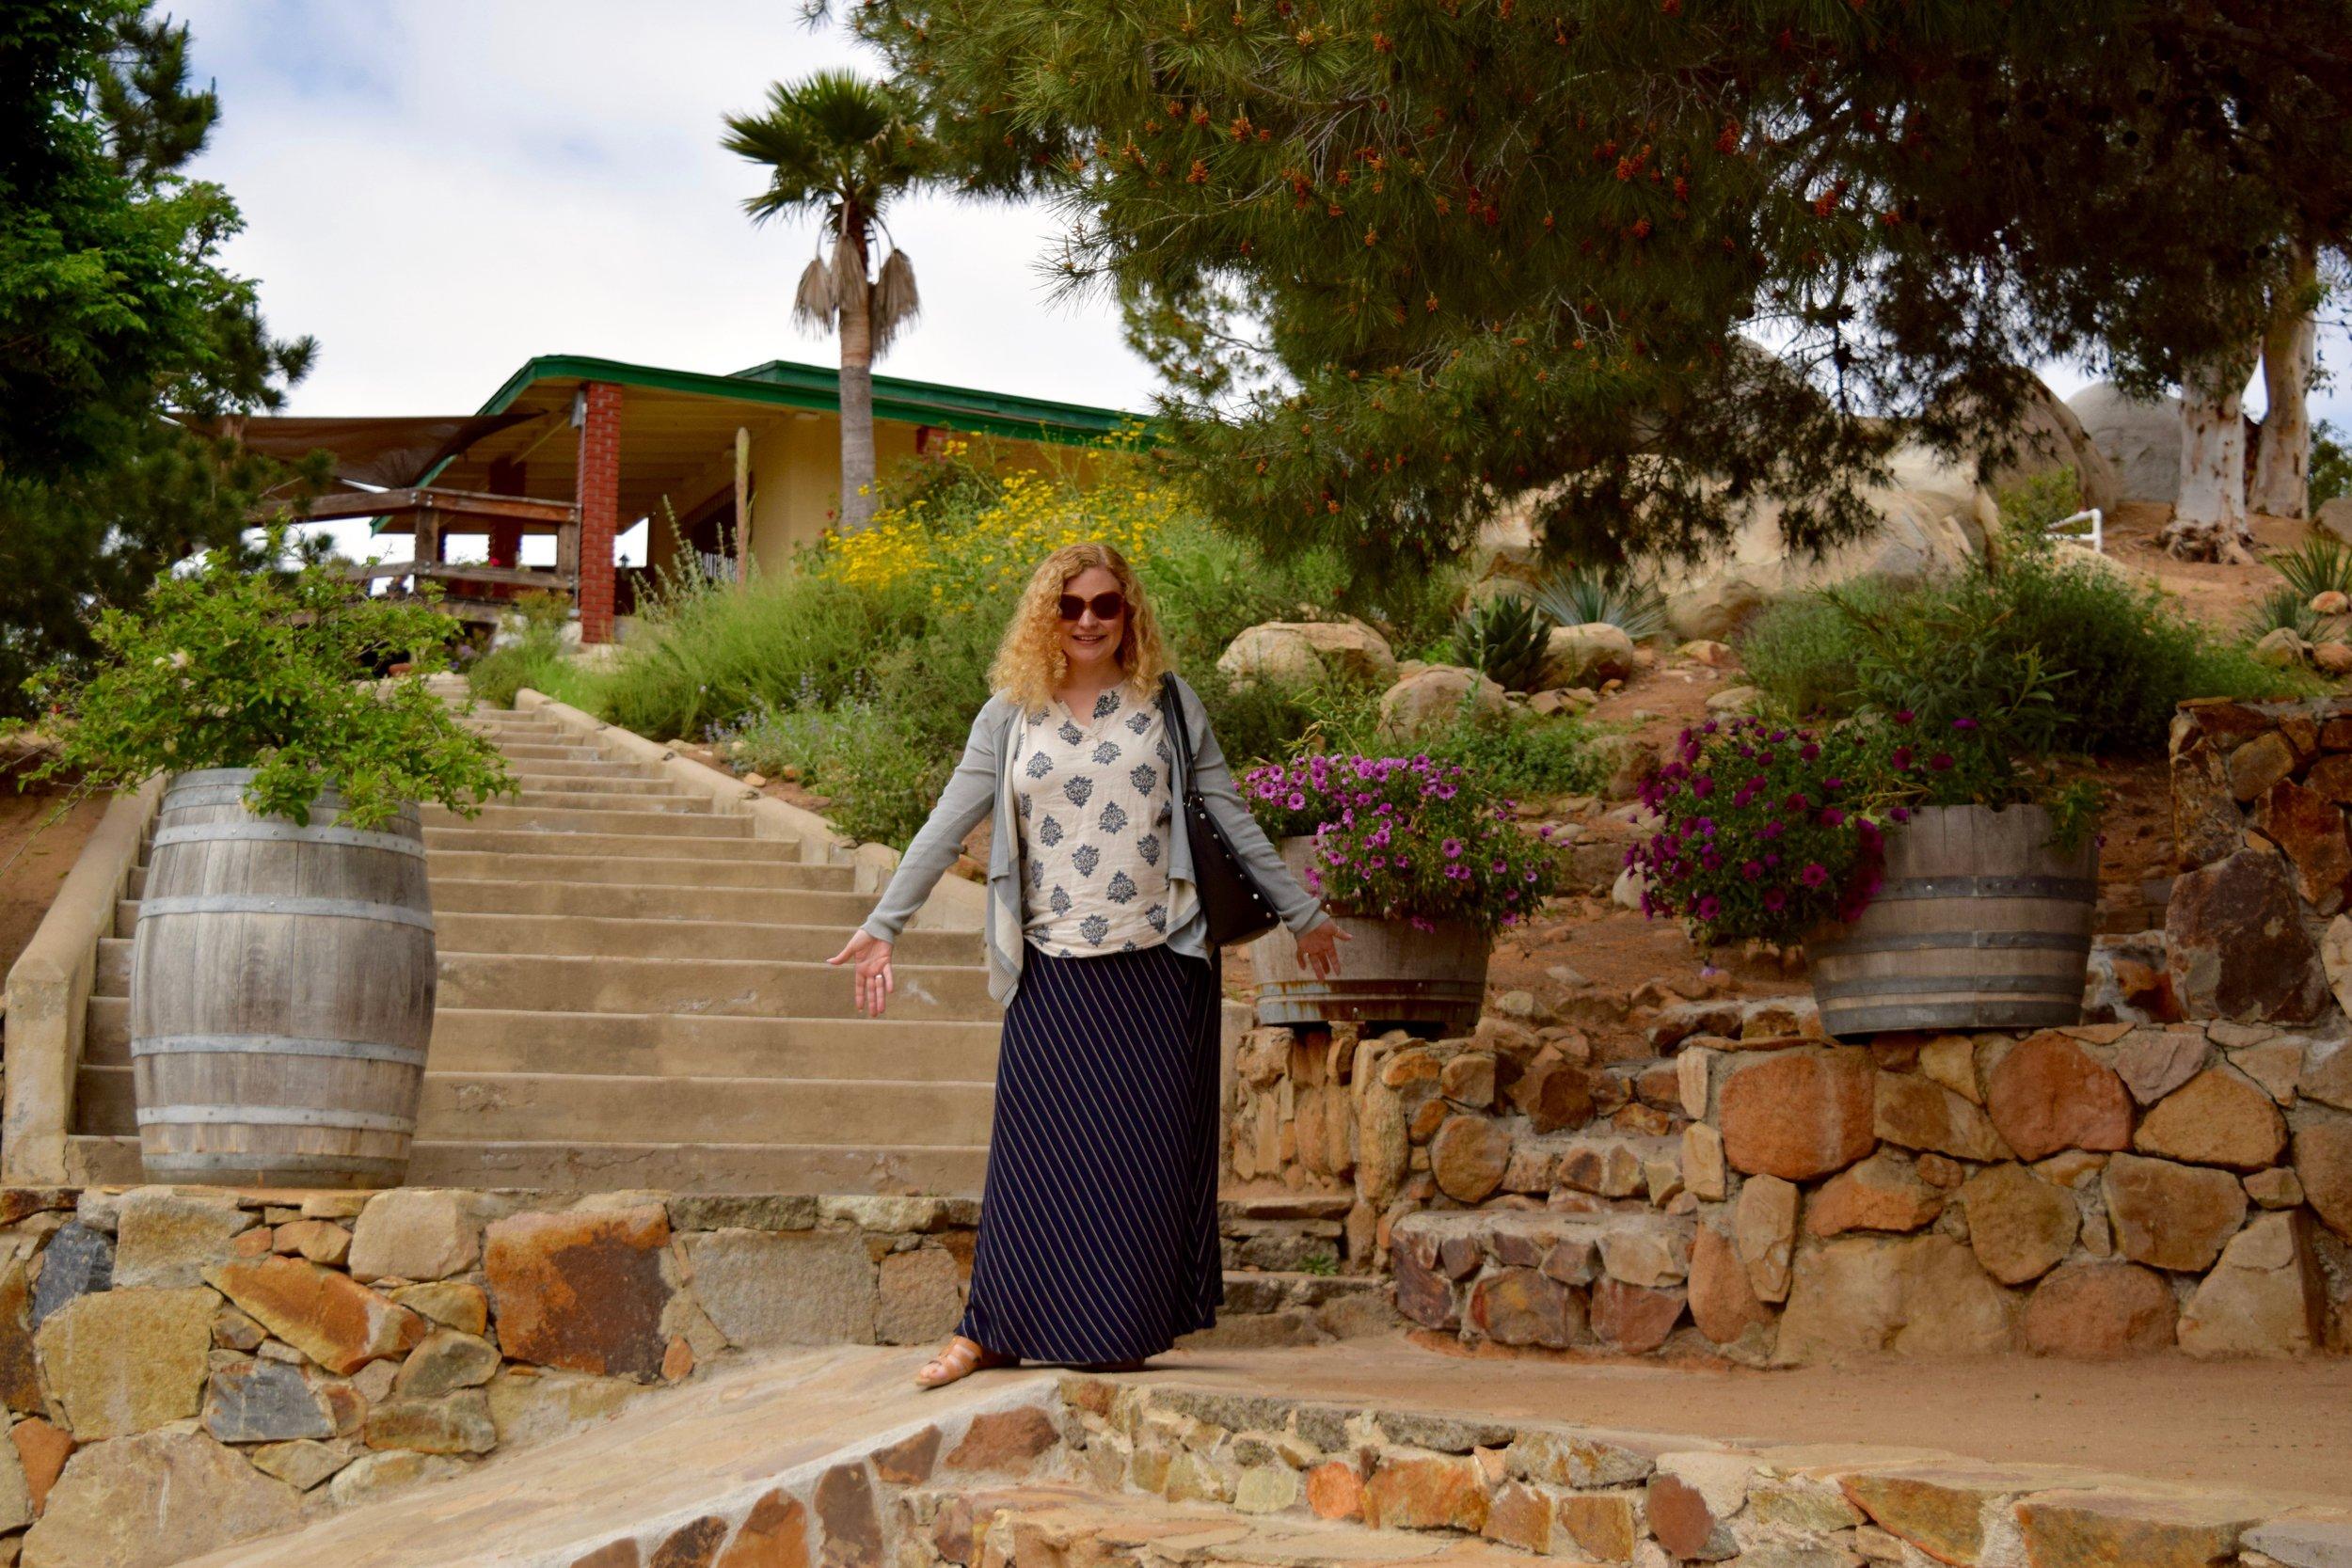 pijoan- joanna posing near ramp.jpg